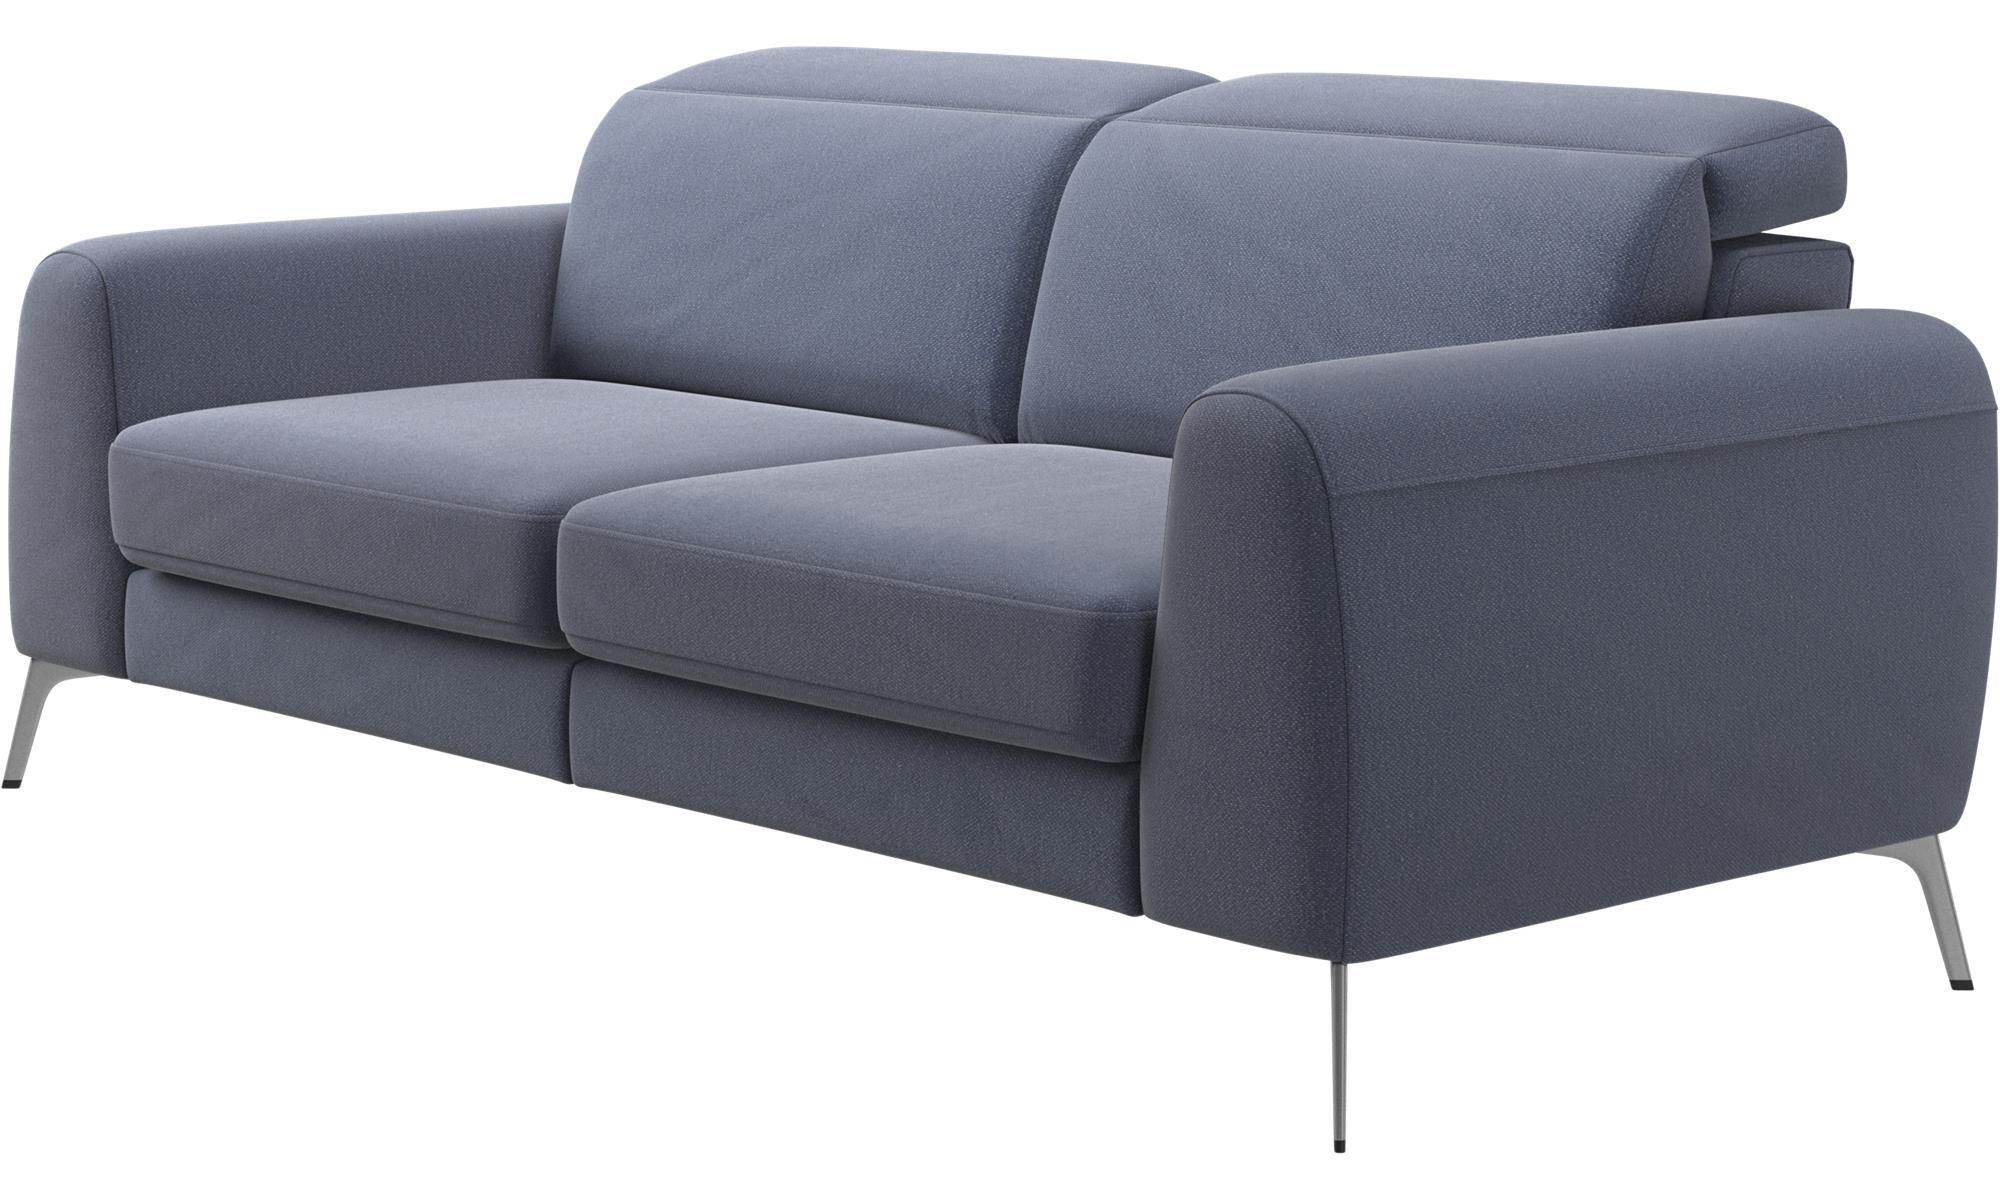 Boconcept Sofa Covers